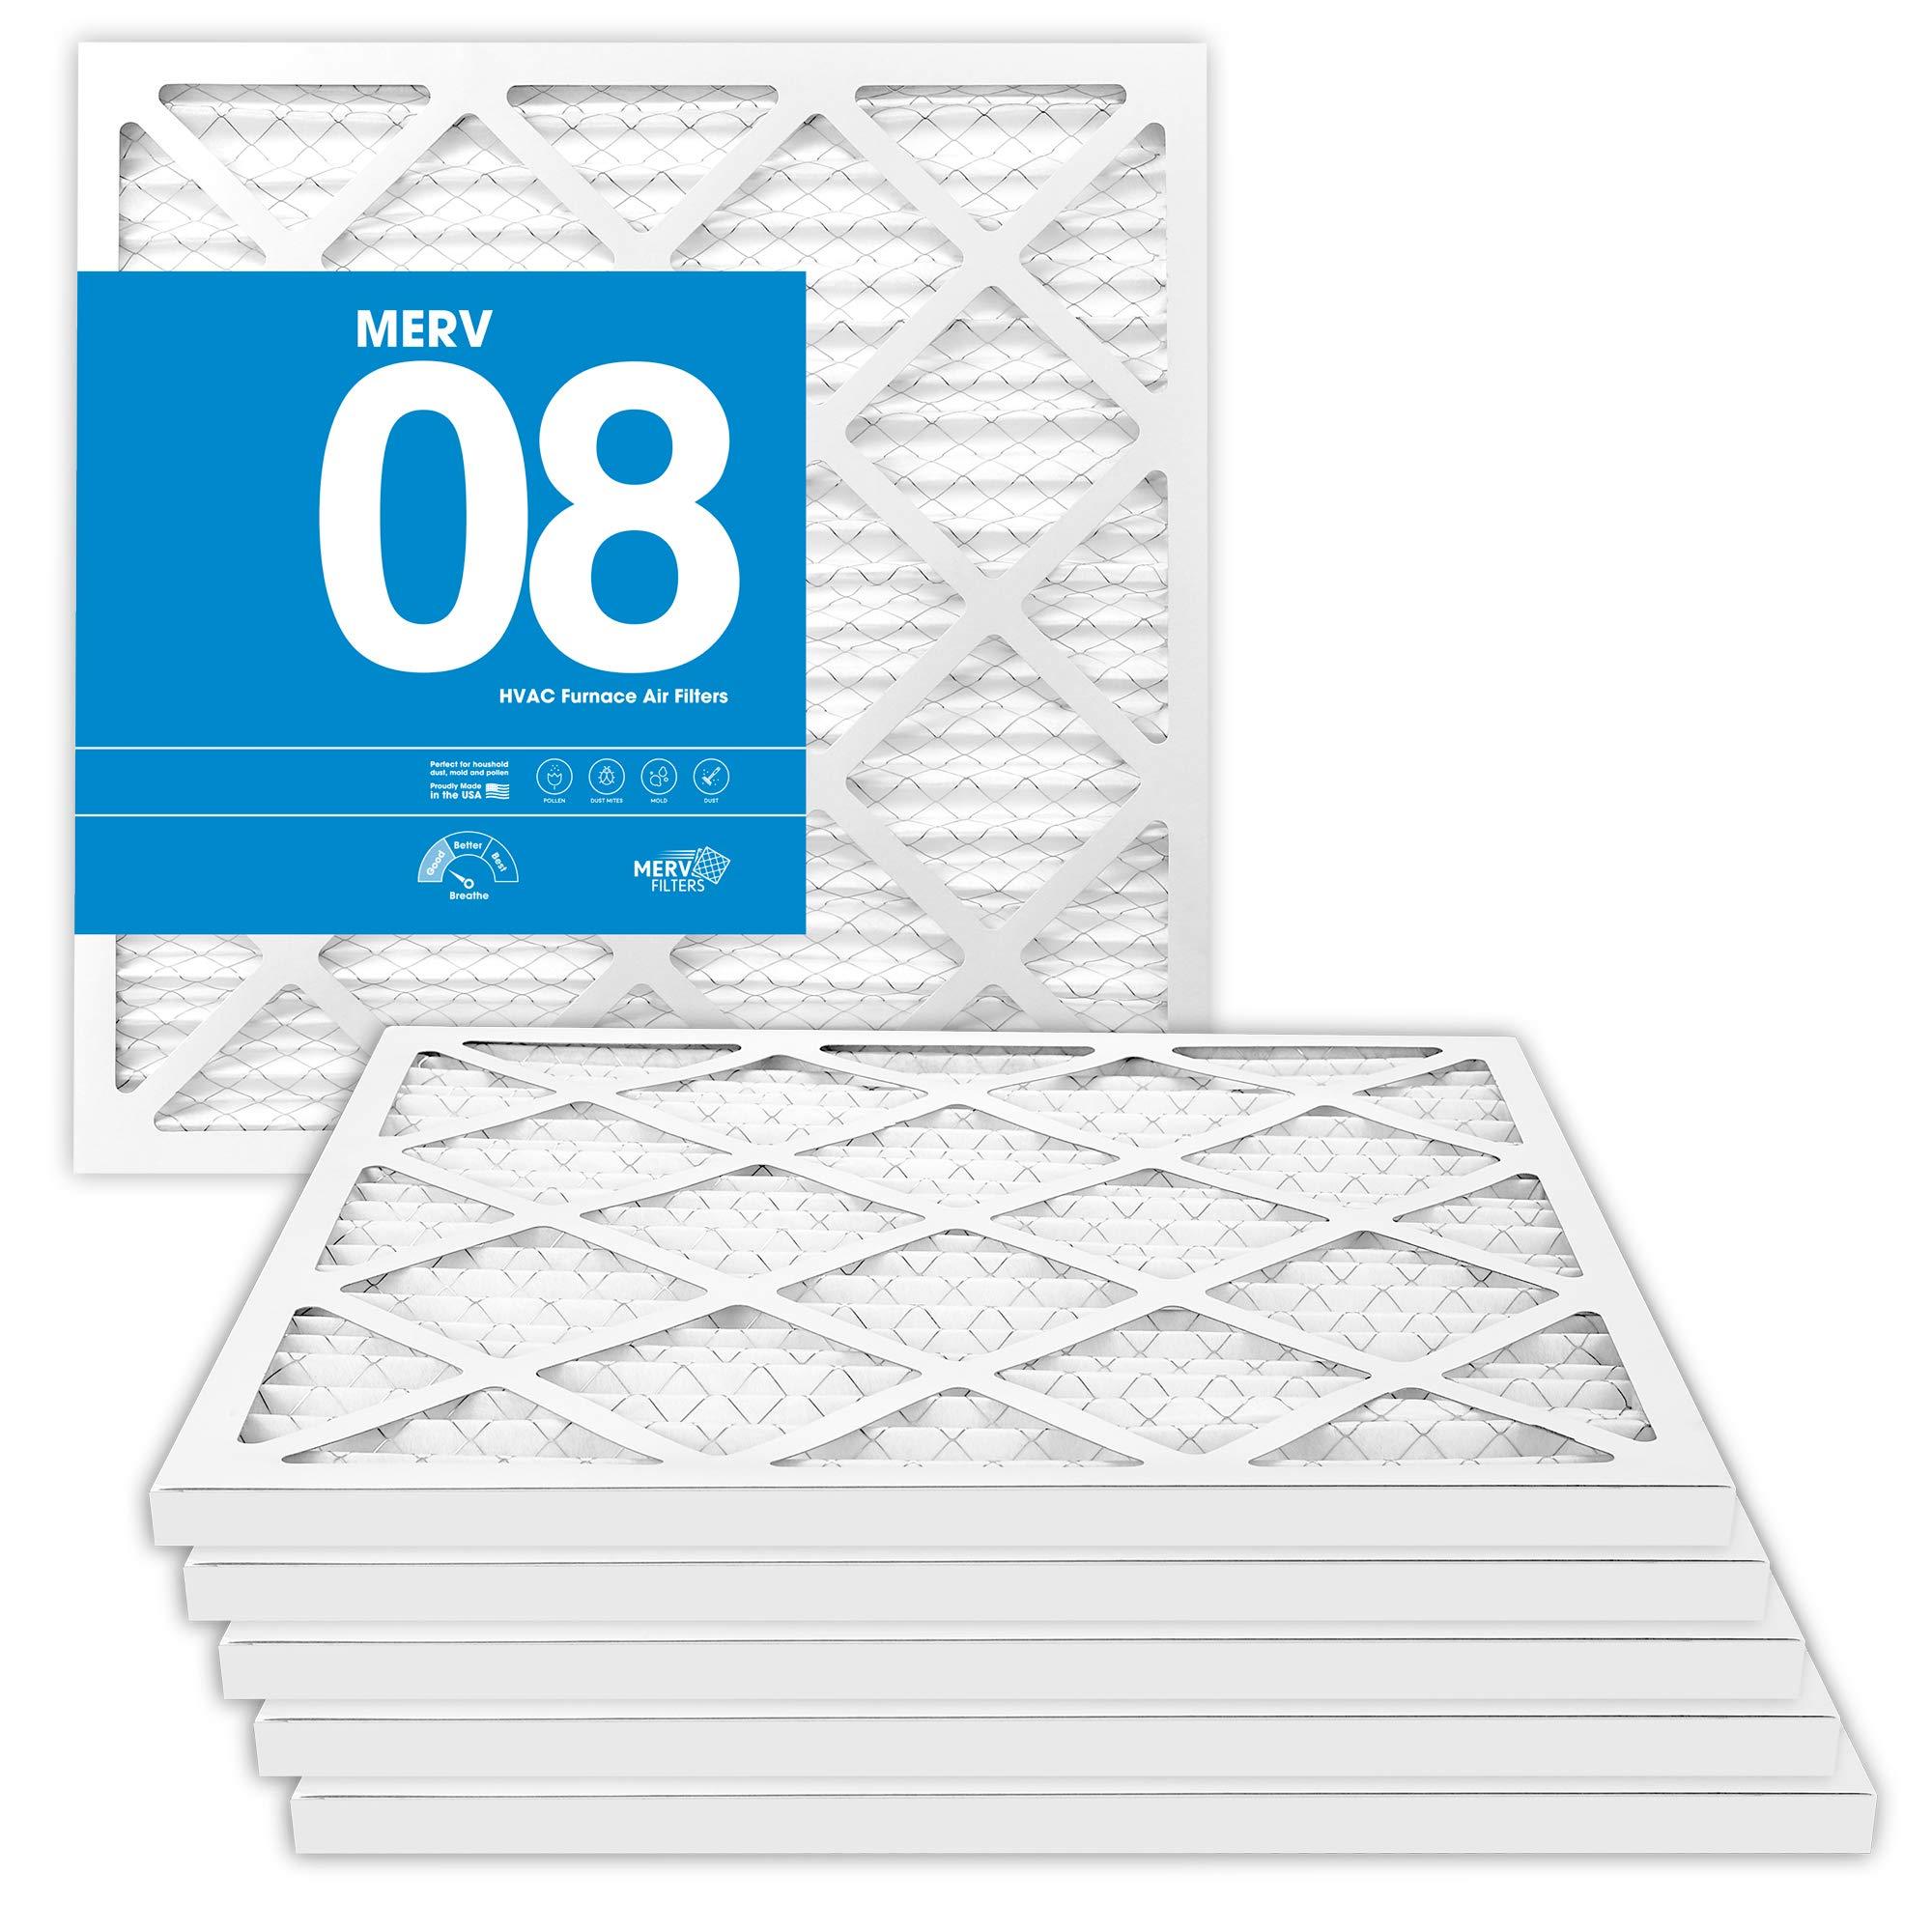 MervFilters 14x14x1 Air Filter, MERV 8, MPR 600-6 Pack of AC Furnace Air Filters by MervFilters